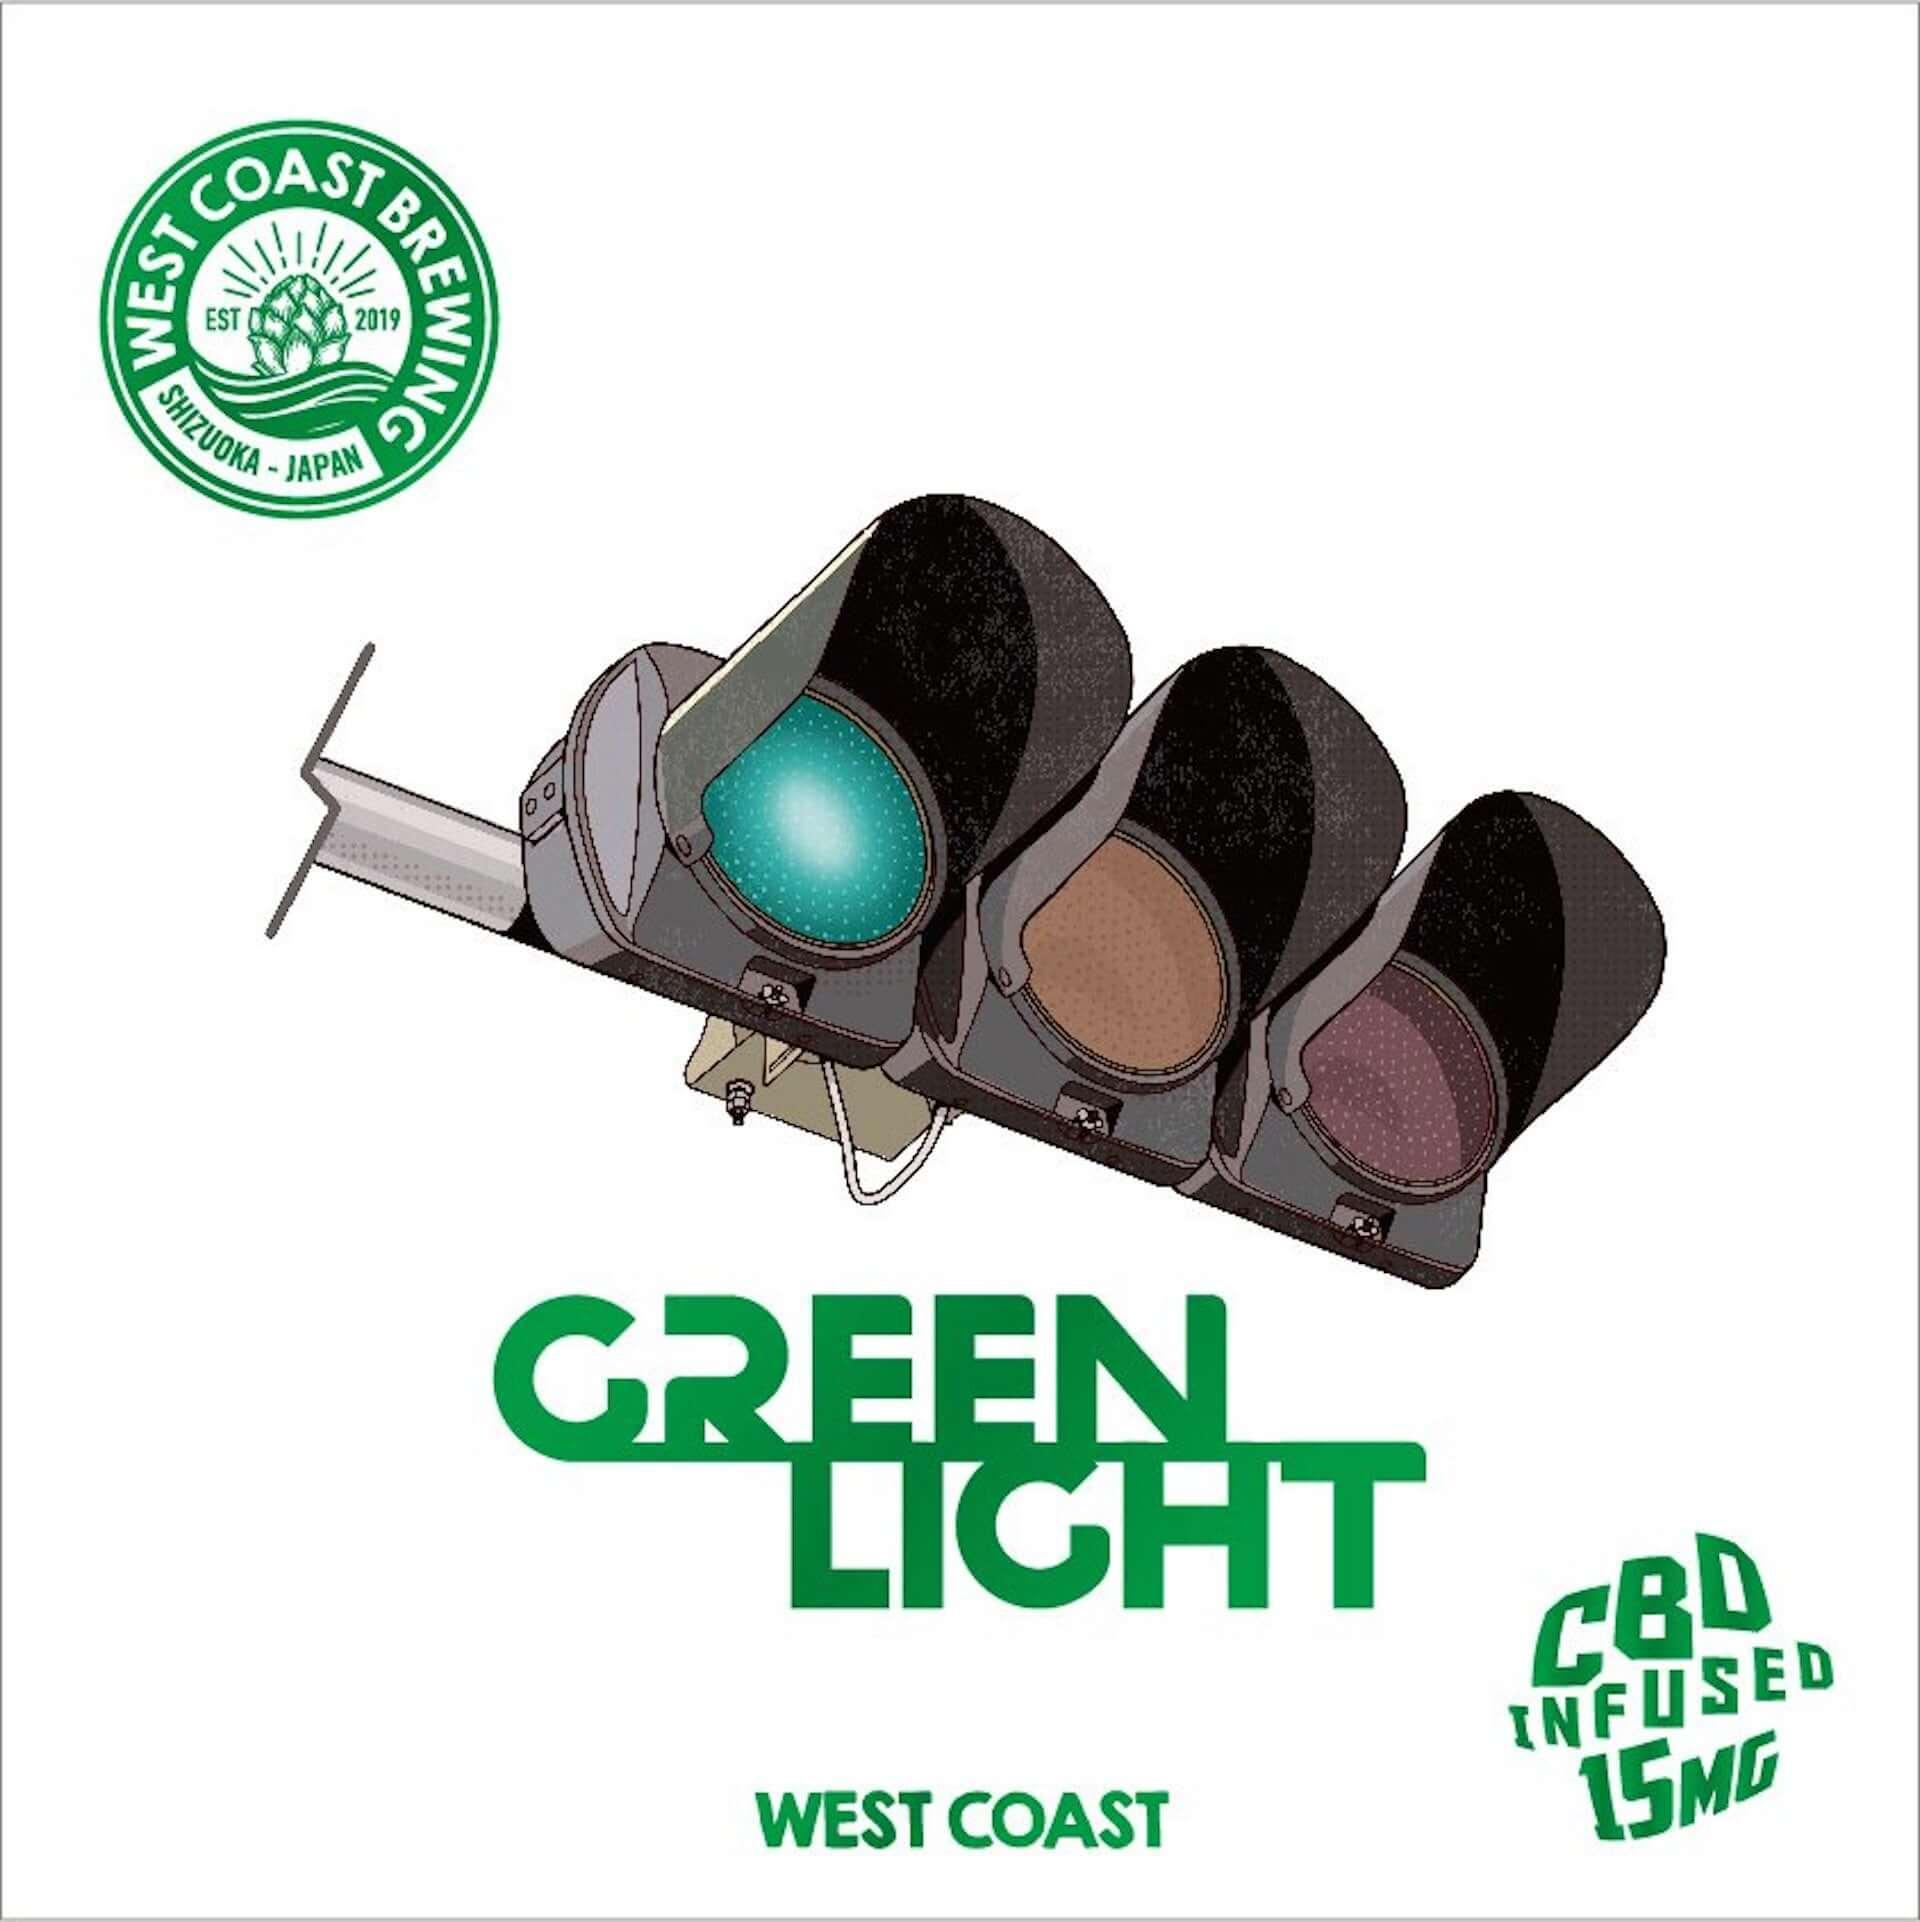 CBD入りクラフトビール『Starwatcher CBD』と『Green Light』がWest Coast Brewingより発売!香り豊かなIPAを採用 gourmet210302_westcoastbrewing_5-1920x1922